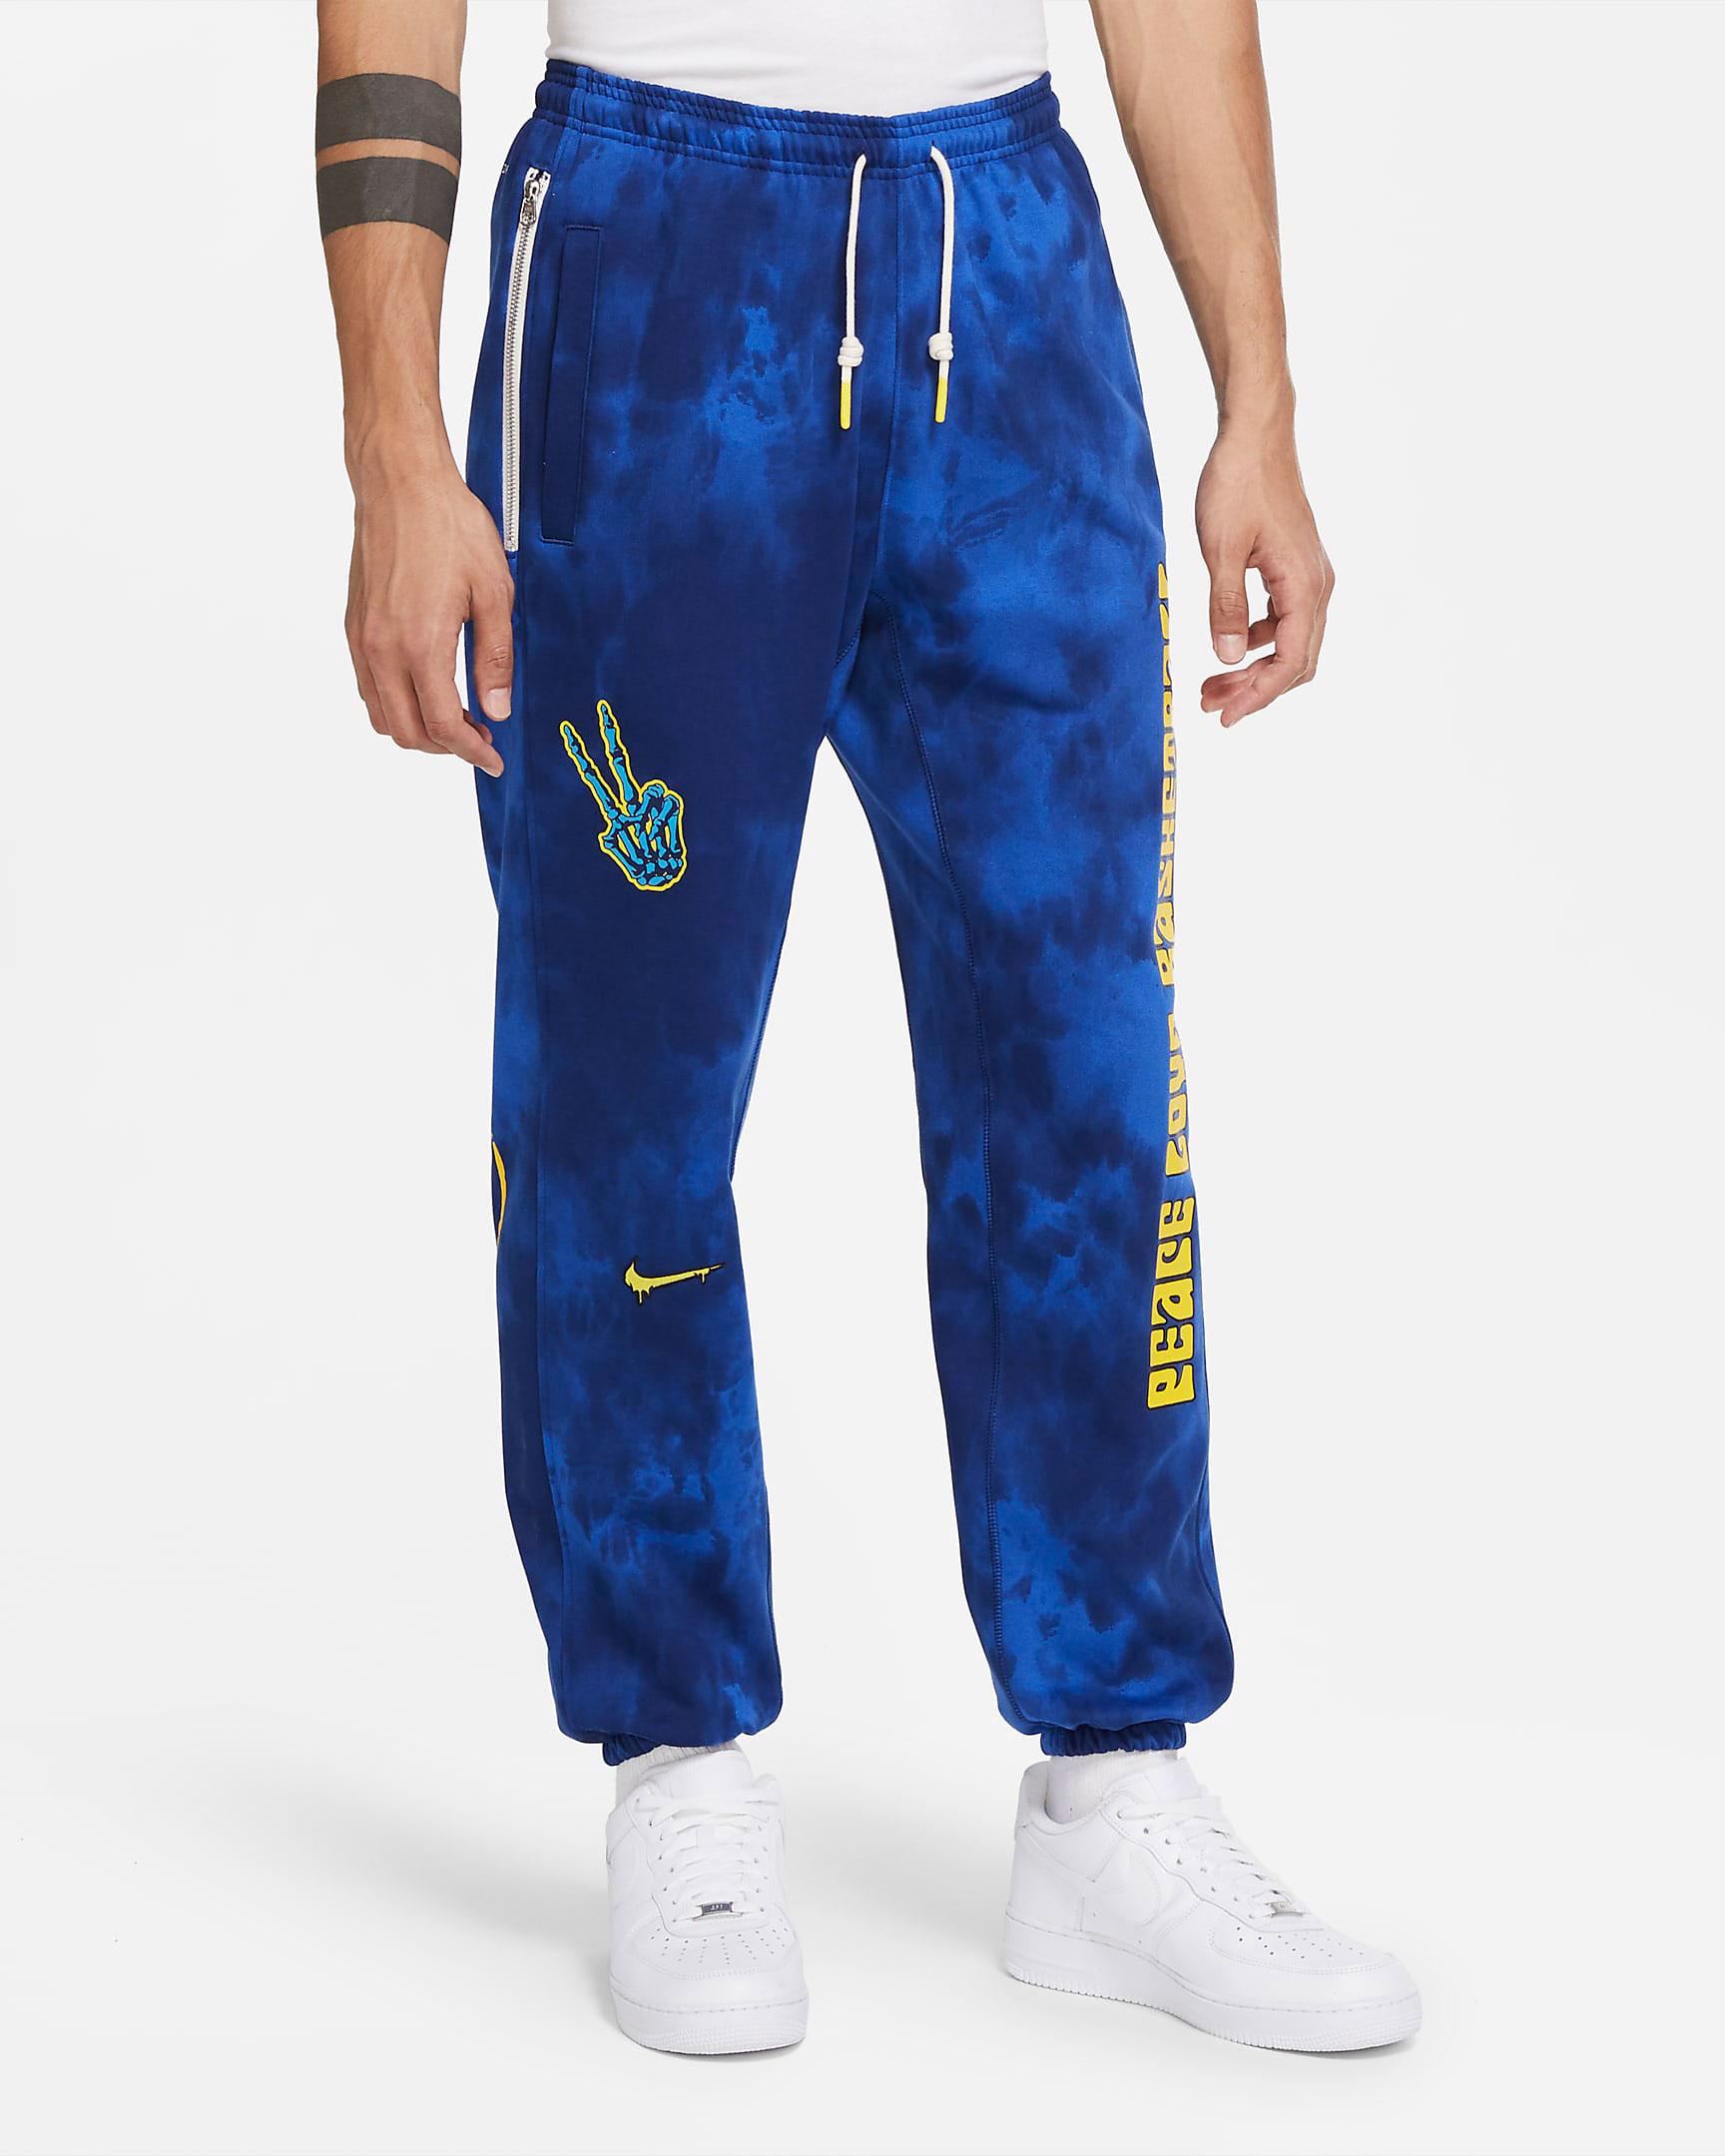 nike-peace-love-basketball-pants-blue-1